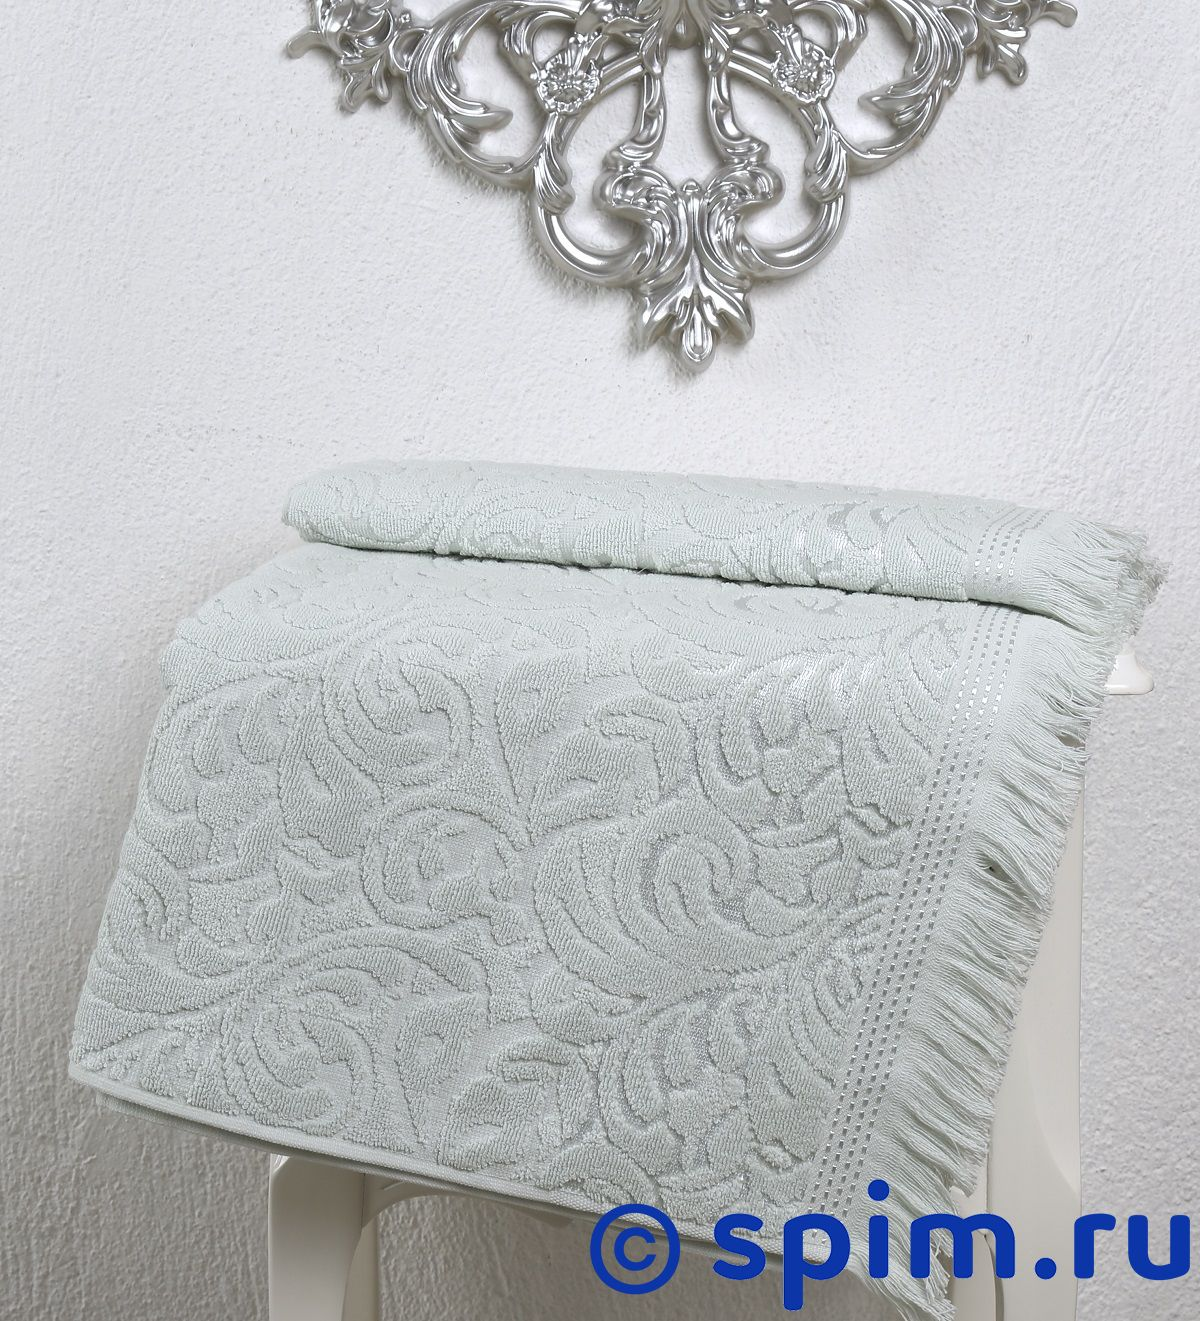 Полотенце Karna Esra 70х140 см, светло-зелёное комплект махровых полотенец karna esra 50x90 70х140 см 1158865